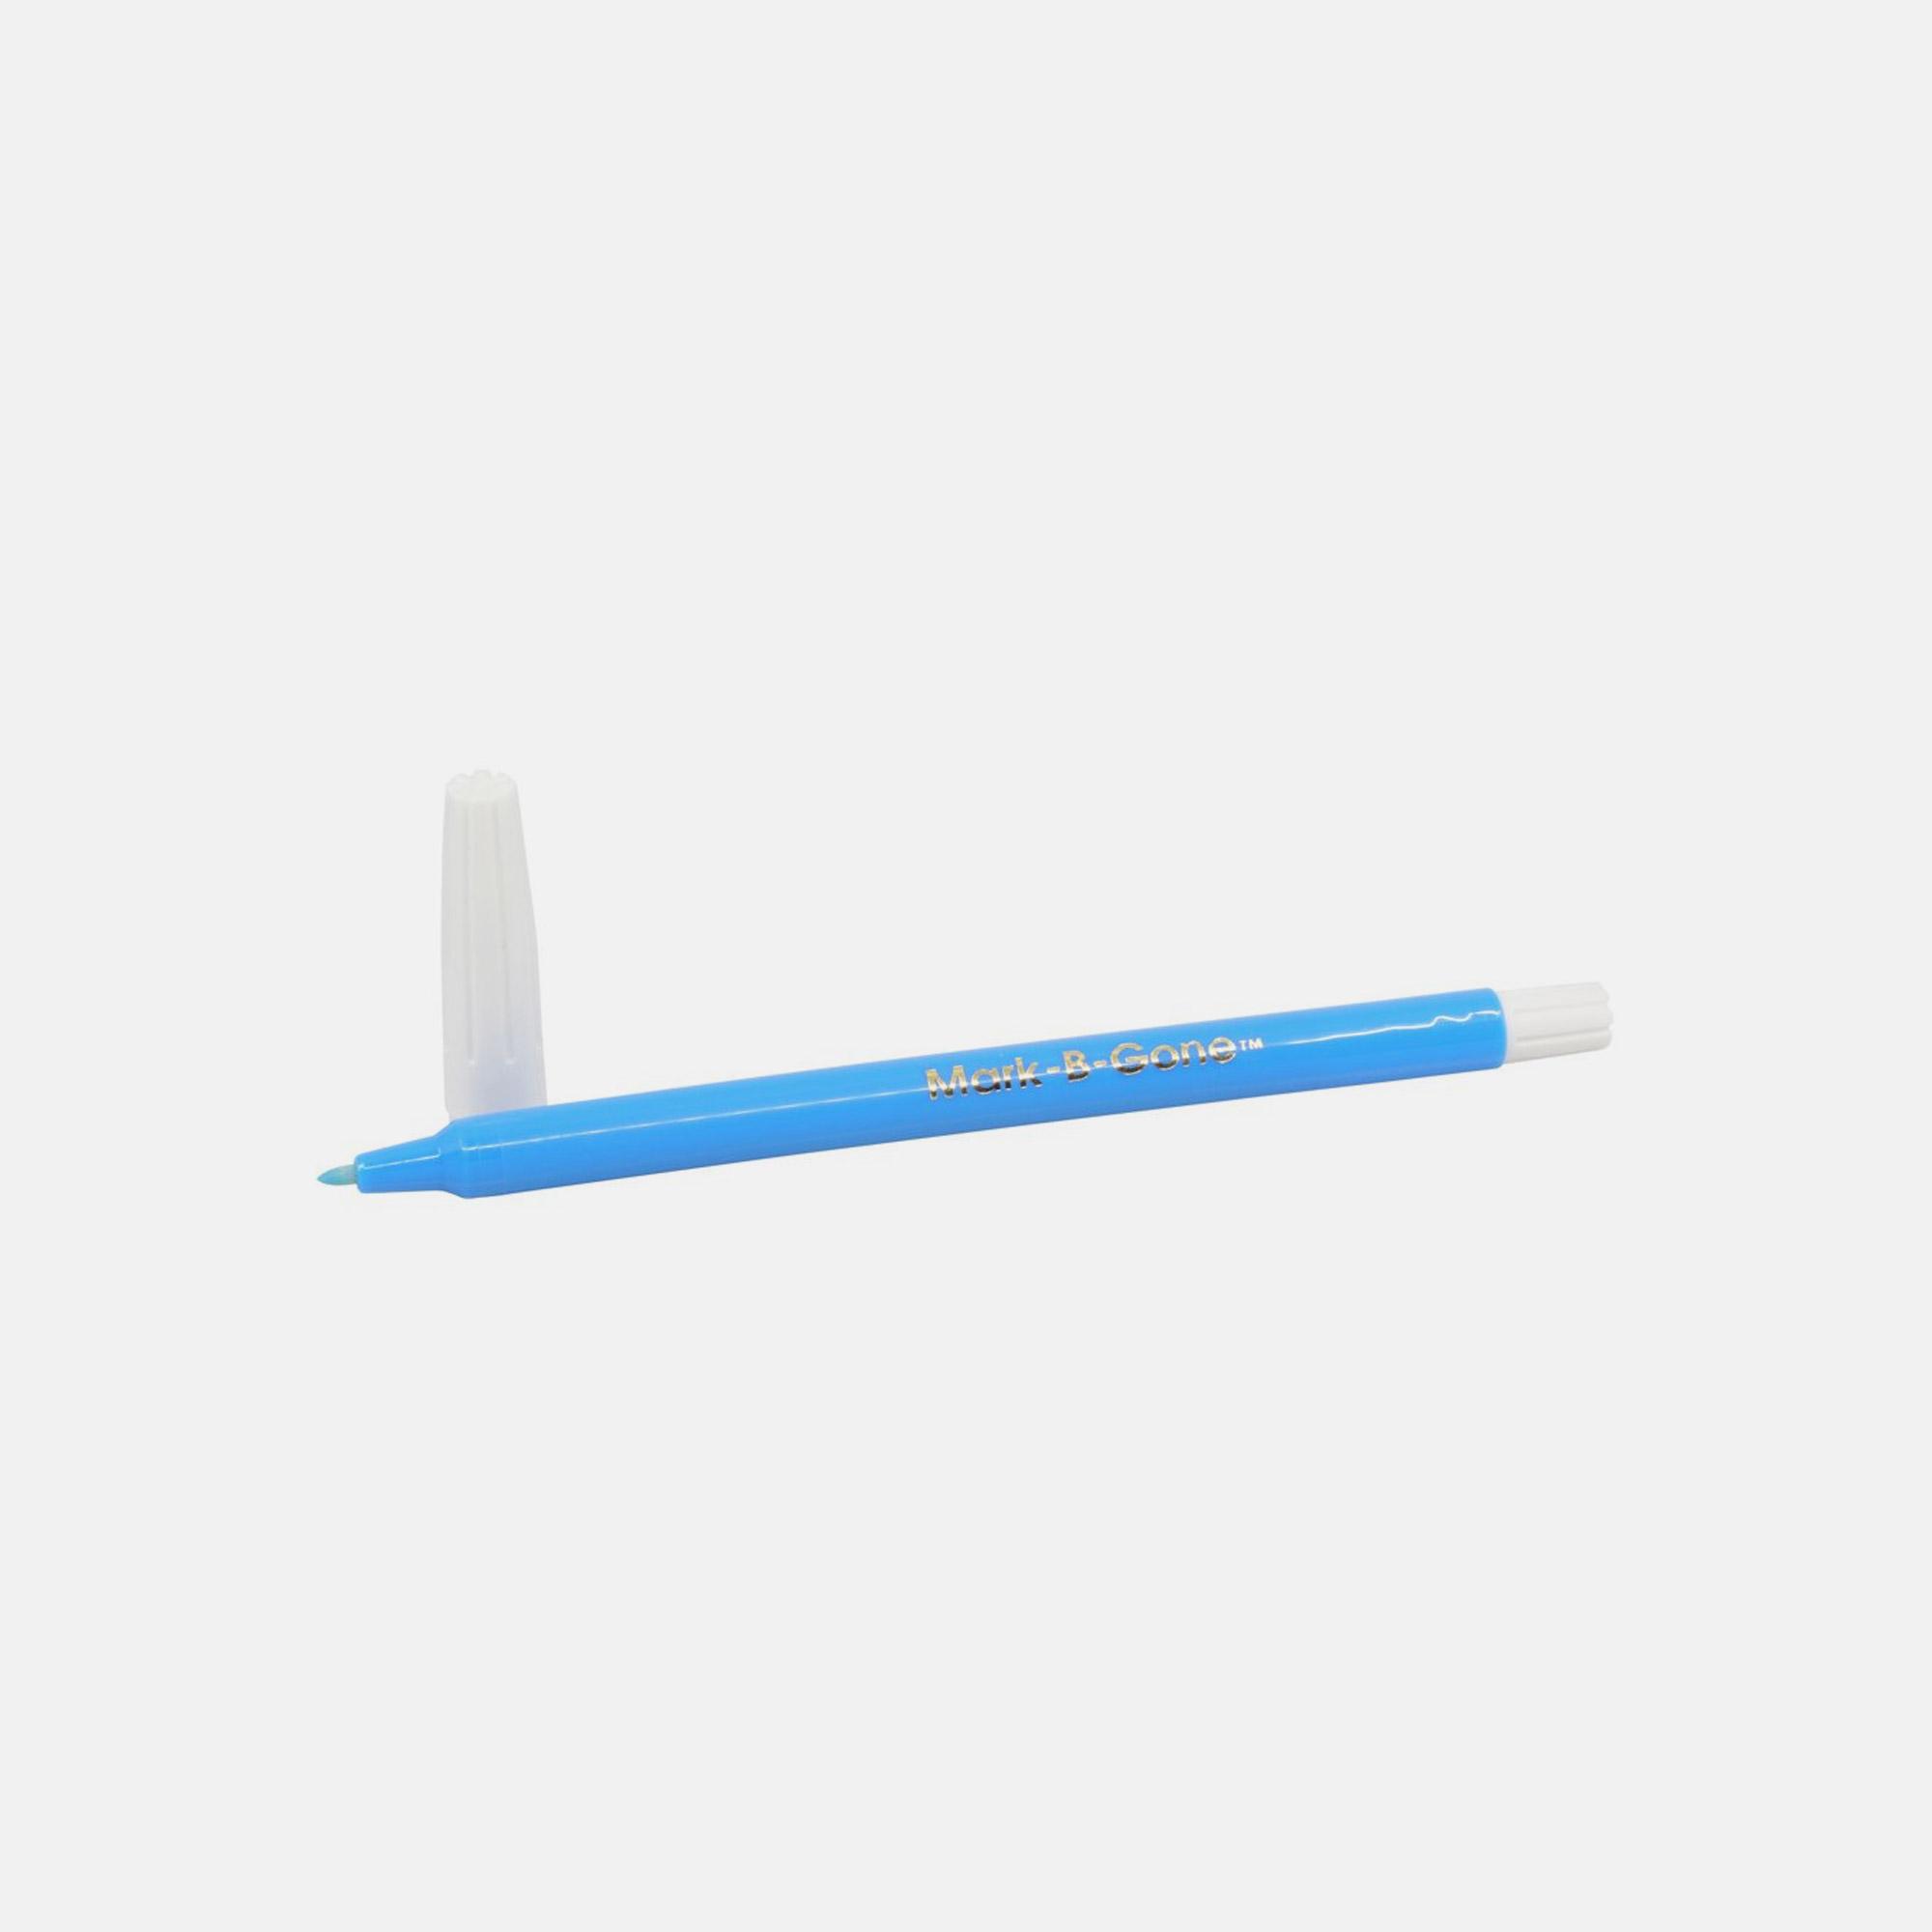 Fosshape Fabric Pen